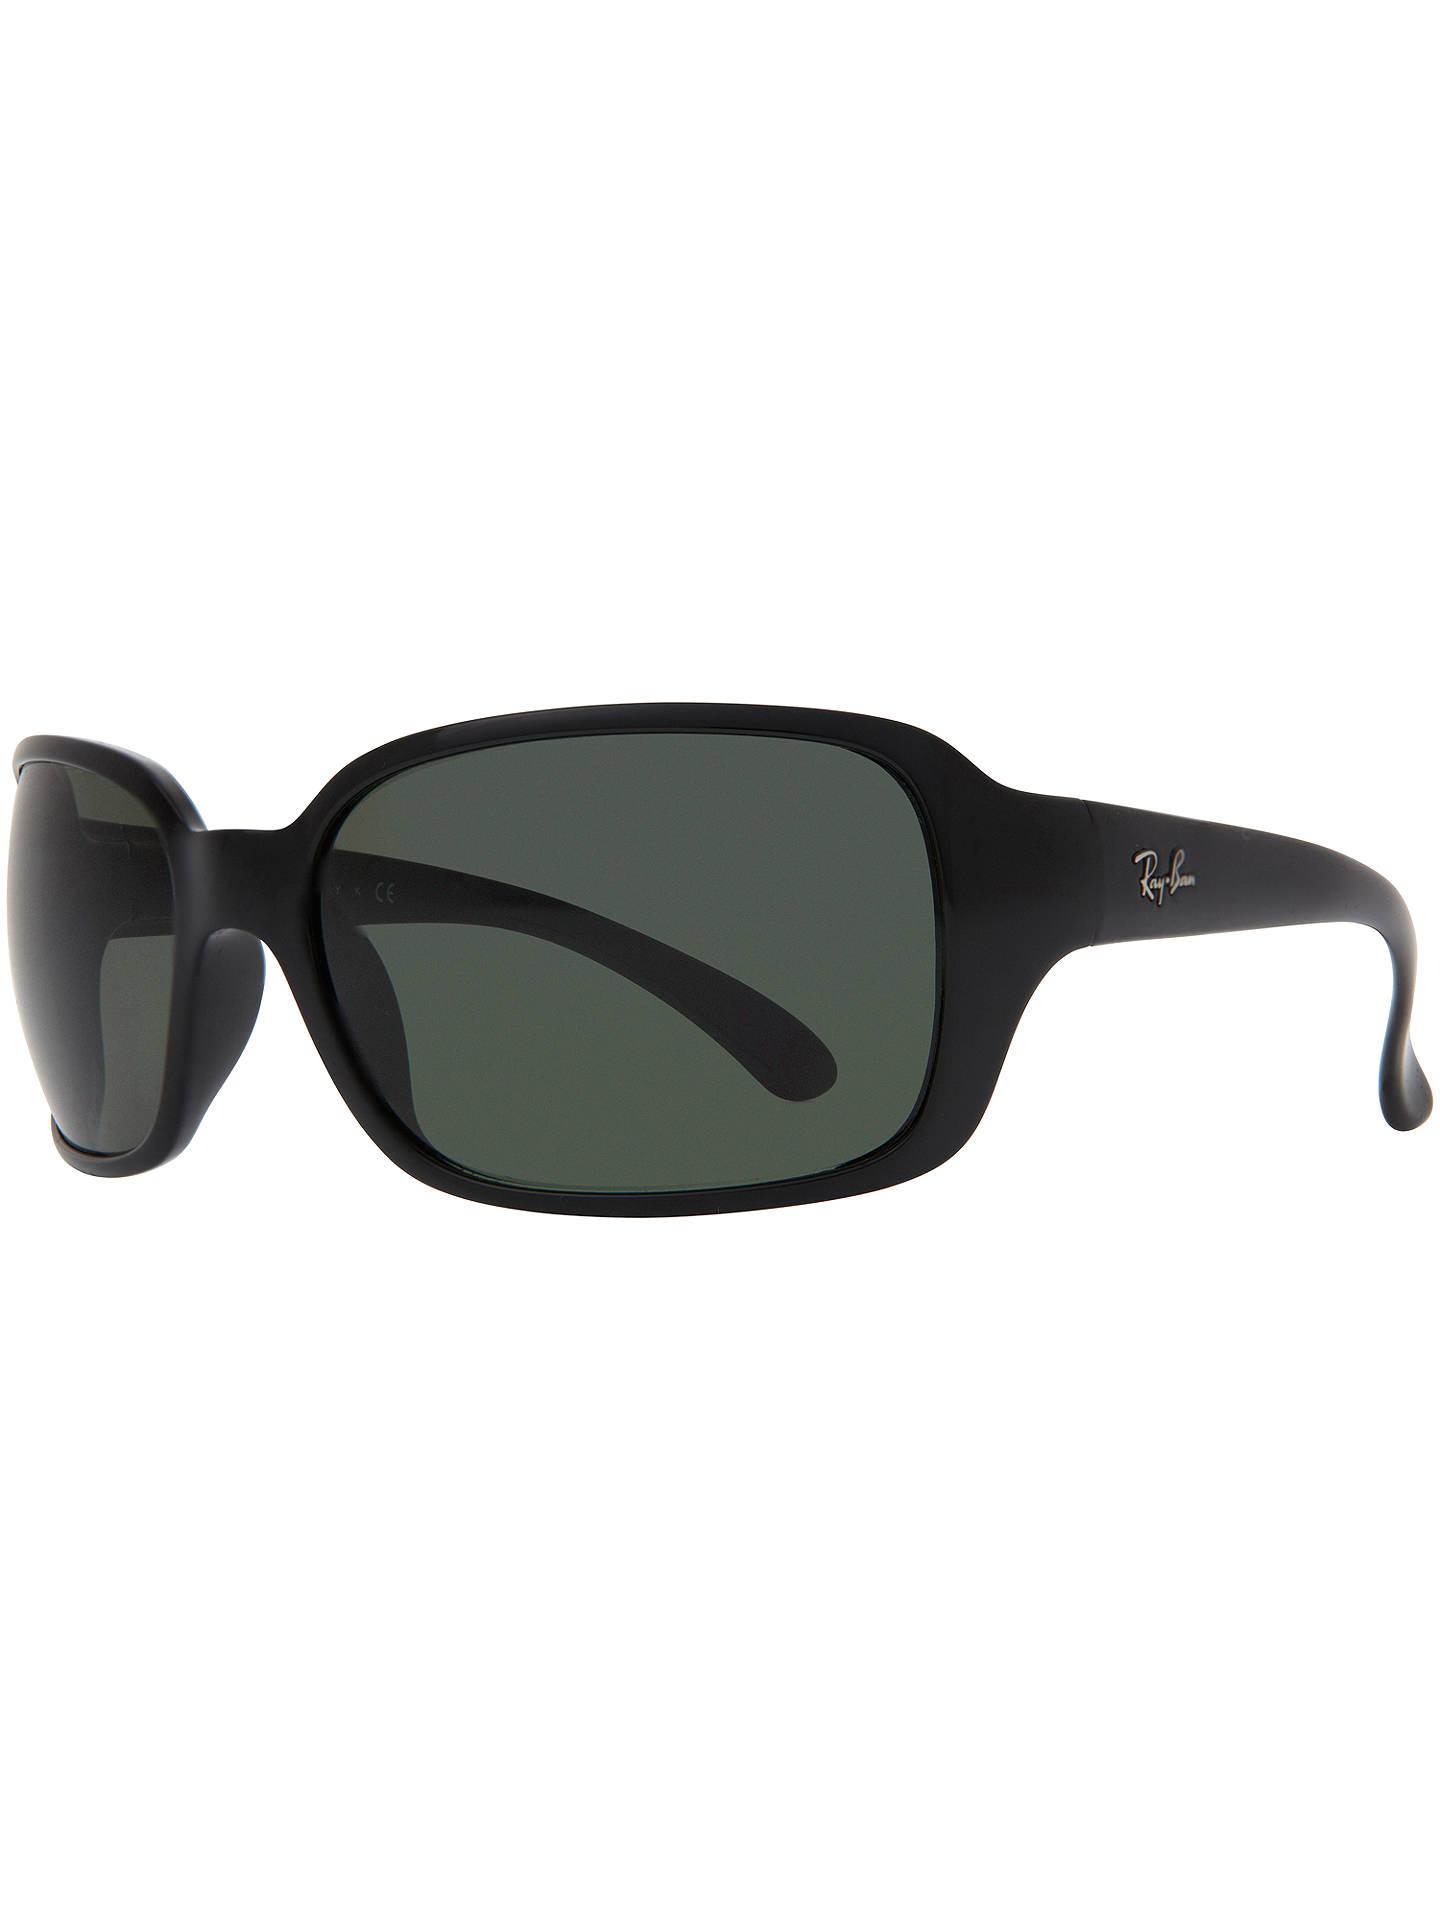 fa579848ba BuyRay-Ban RB4068 Rectangular Sunglasses